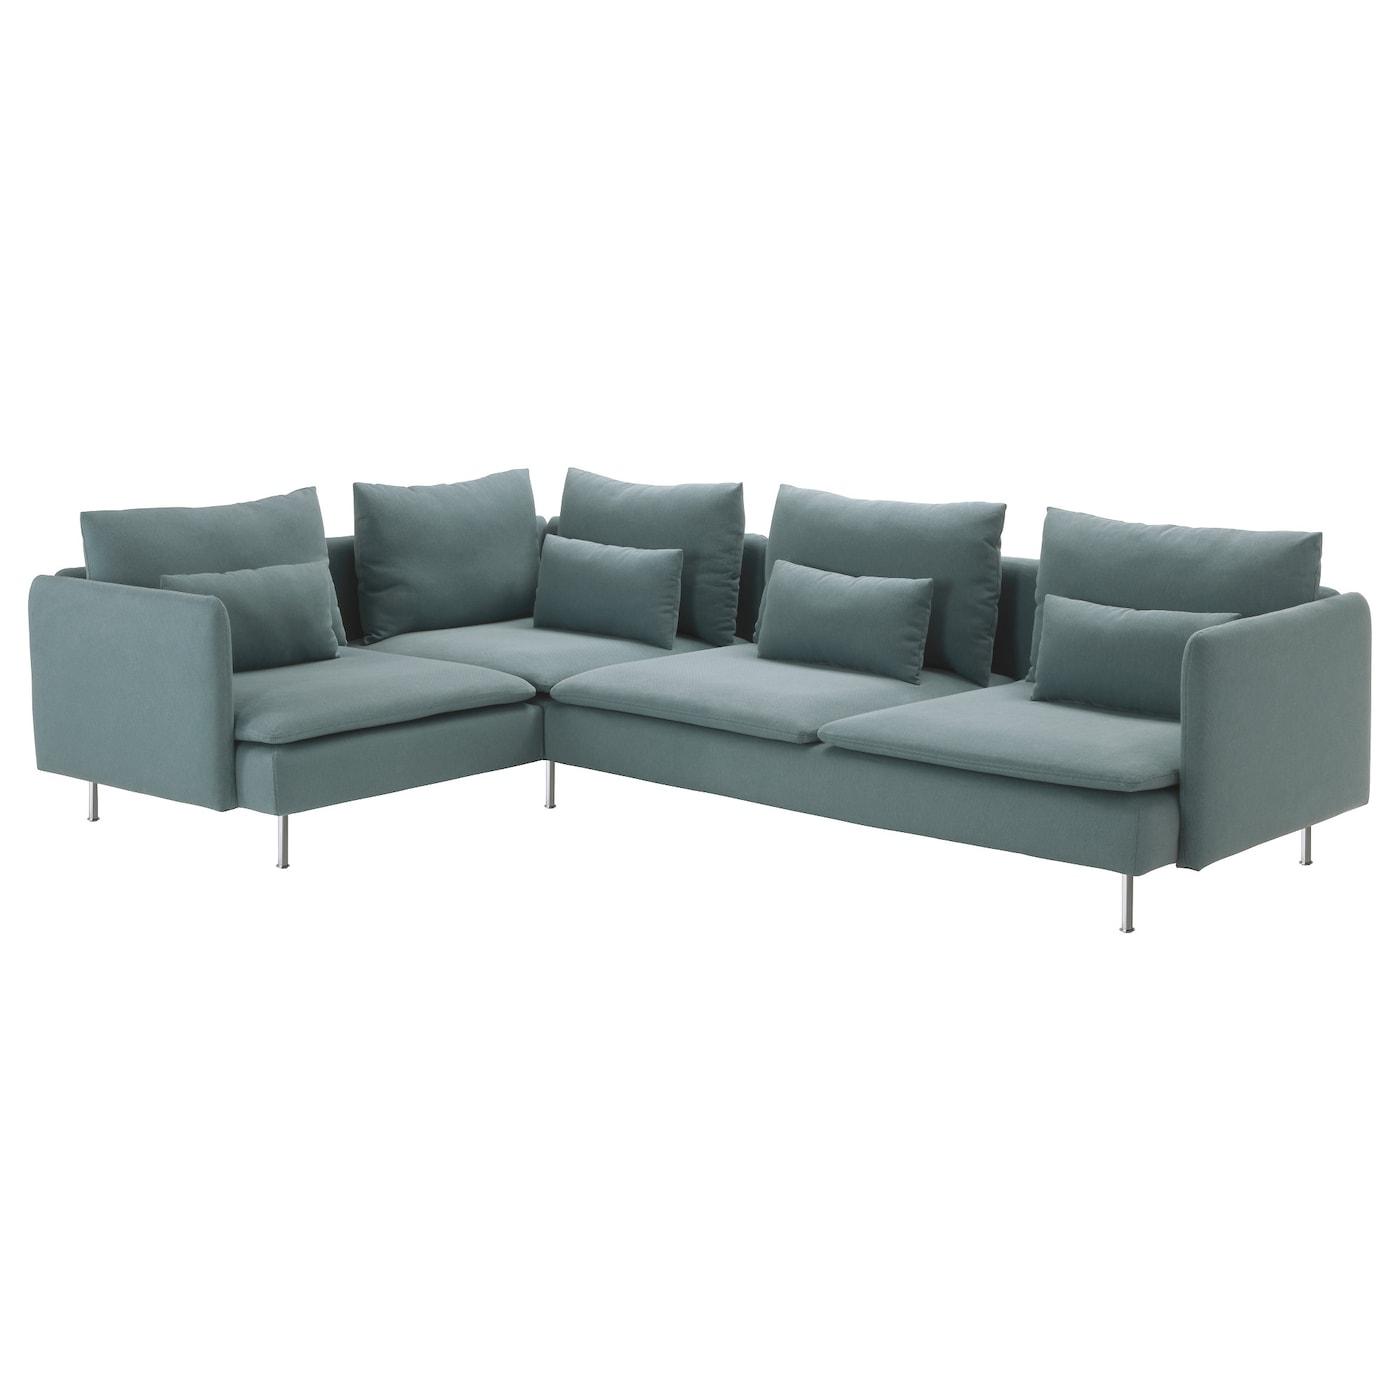 SDERHAMN Corner Sofa 21 Finnsta Turquoise 291x198 Cm IKEA